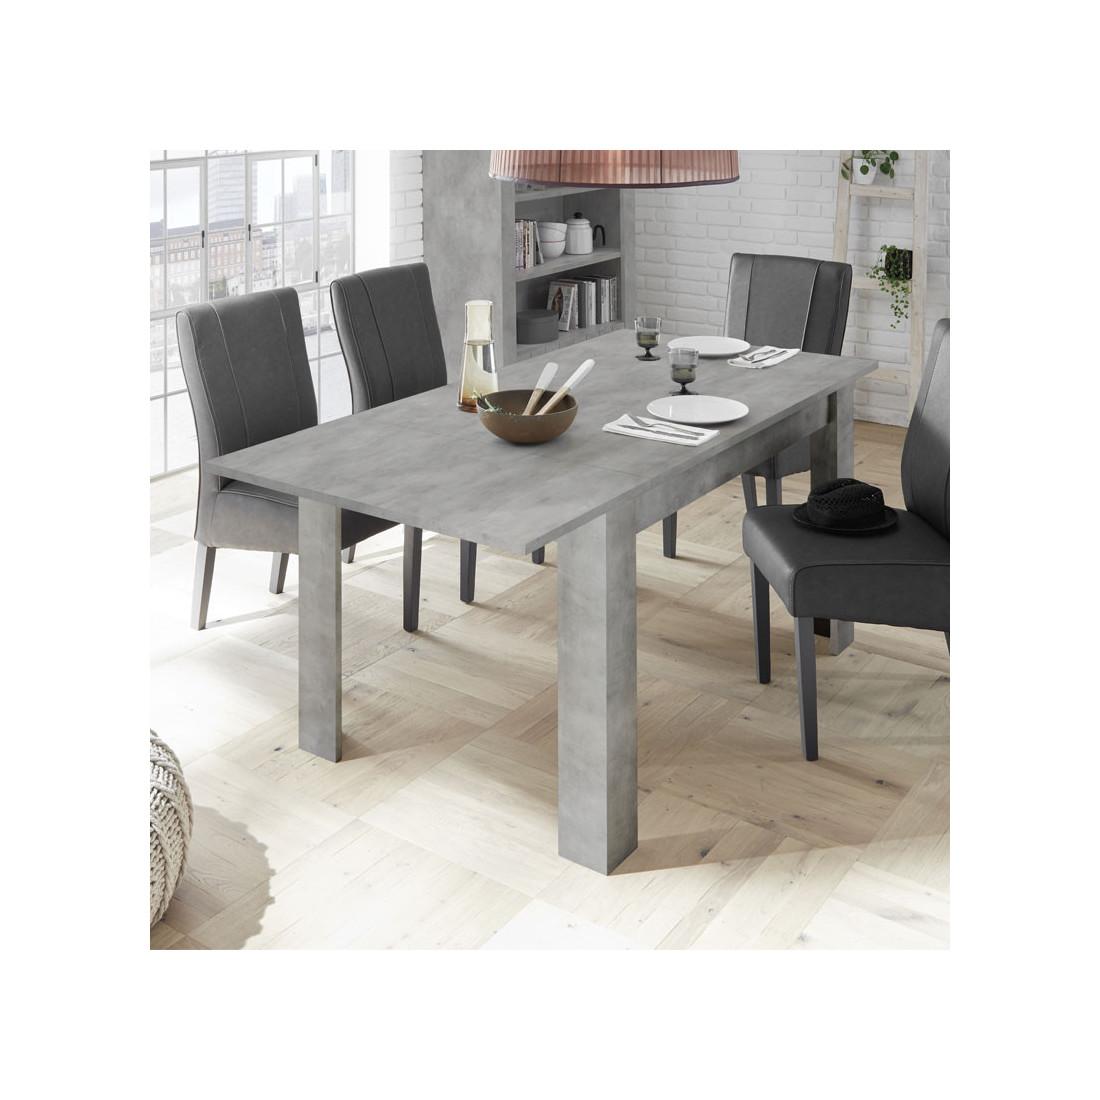 table de repas allonge b ton cir clair lubio univers salle manger. Black Bedroom Furniture Sets. Home Design Ideas